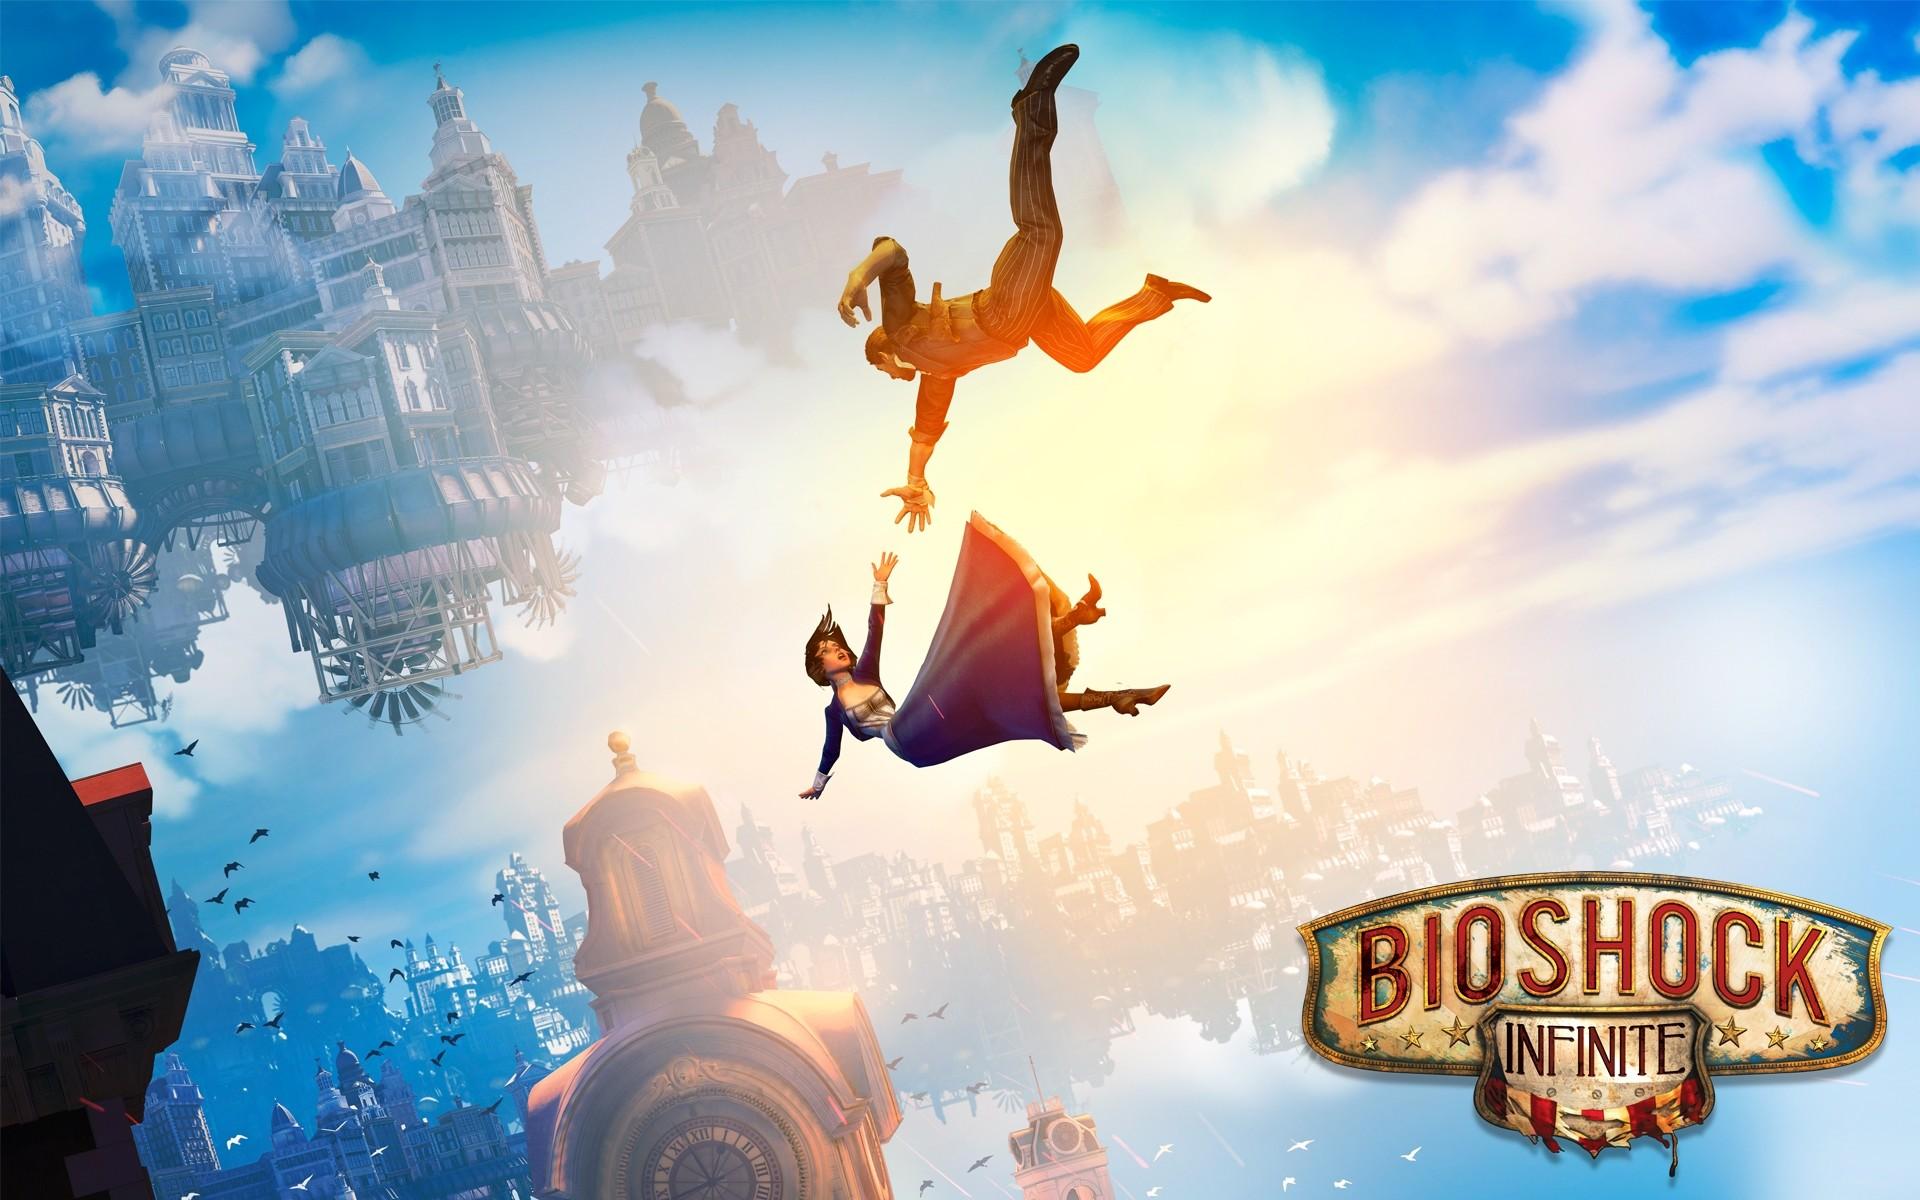 Fine Backgrounds Collection: BioShock Infinite Video Game Desktop Wallpapers